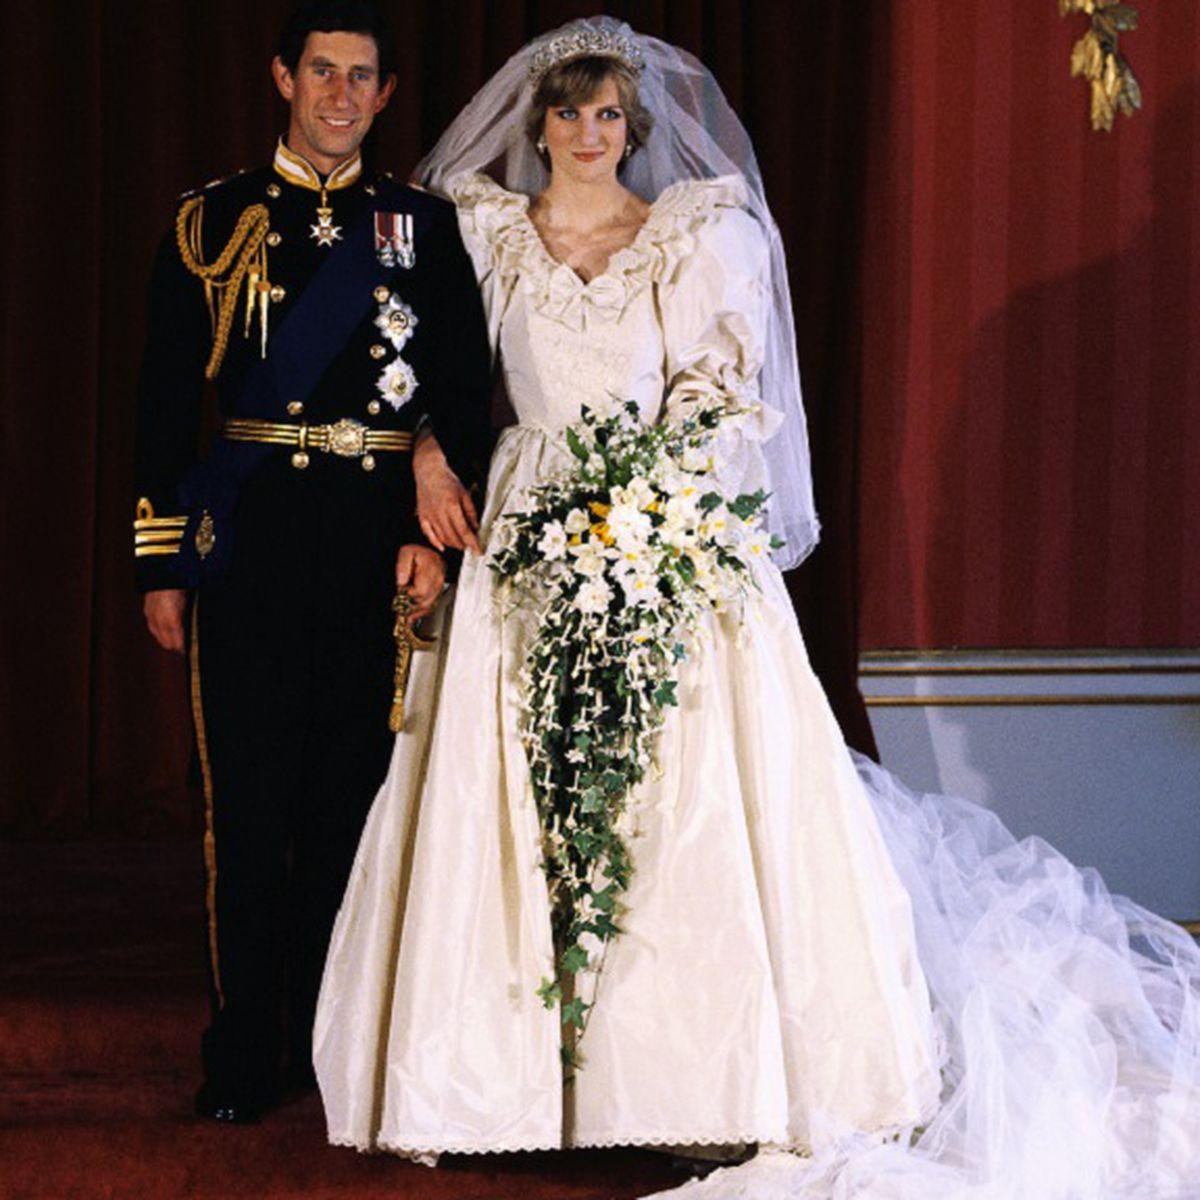 princess diana had a secret second wedding dress 9honey princess diana had a secret second